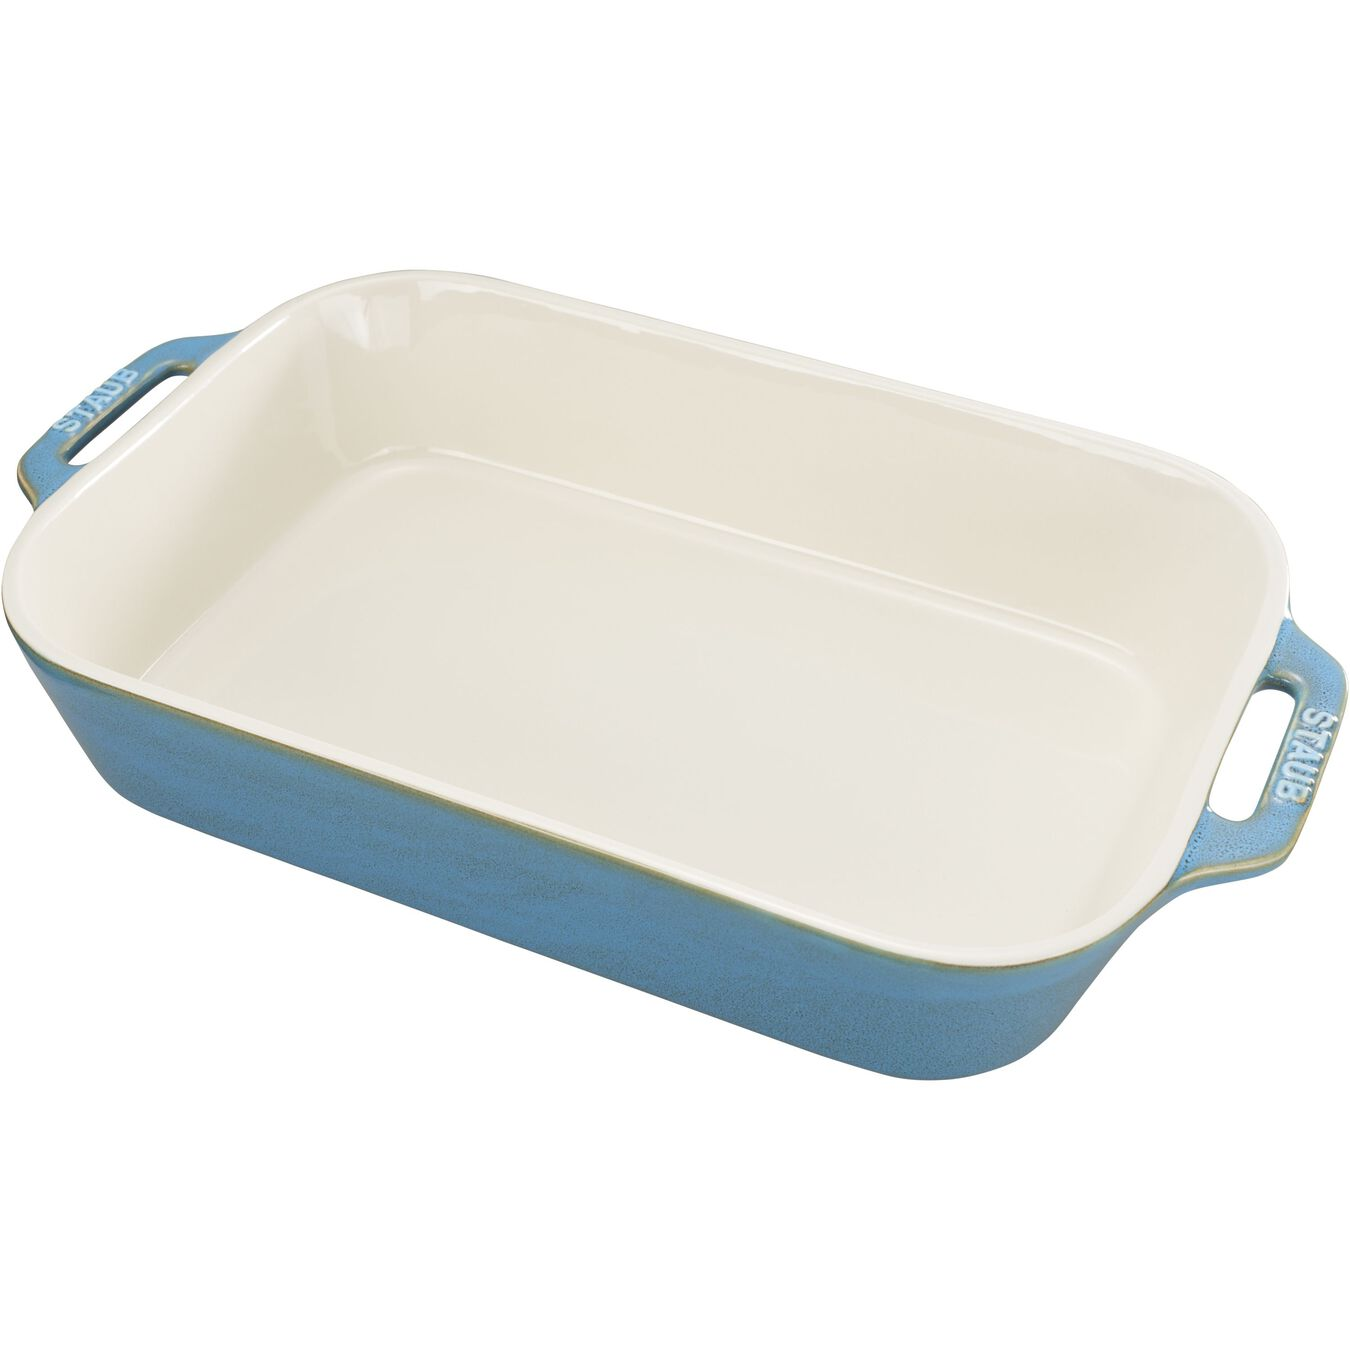 13-x 9-inch, rectangular, Baking Dish, rustic turquoise,,large 1